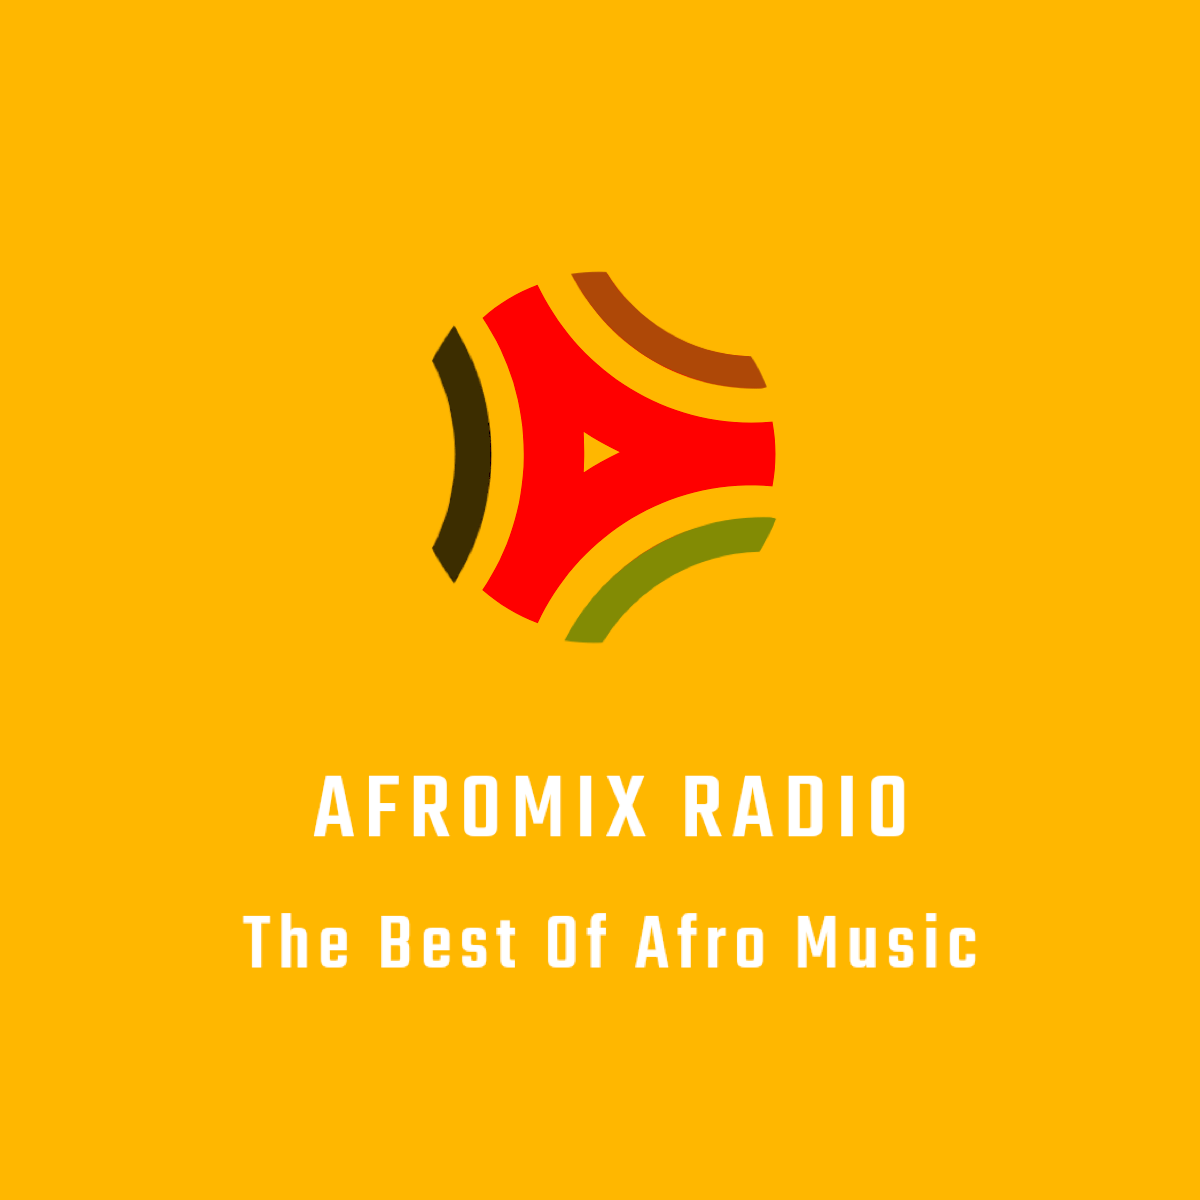 Afromix radio